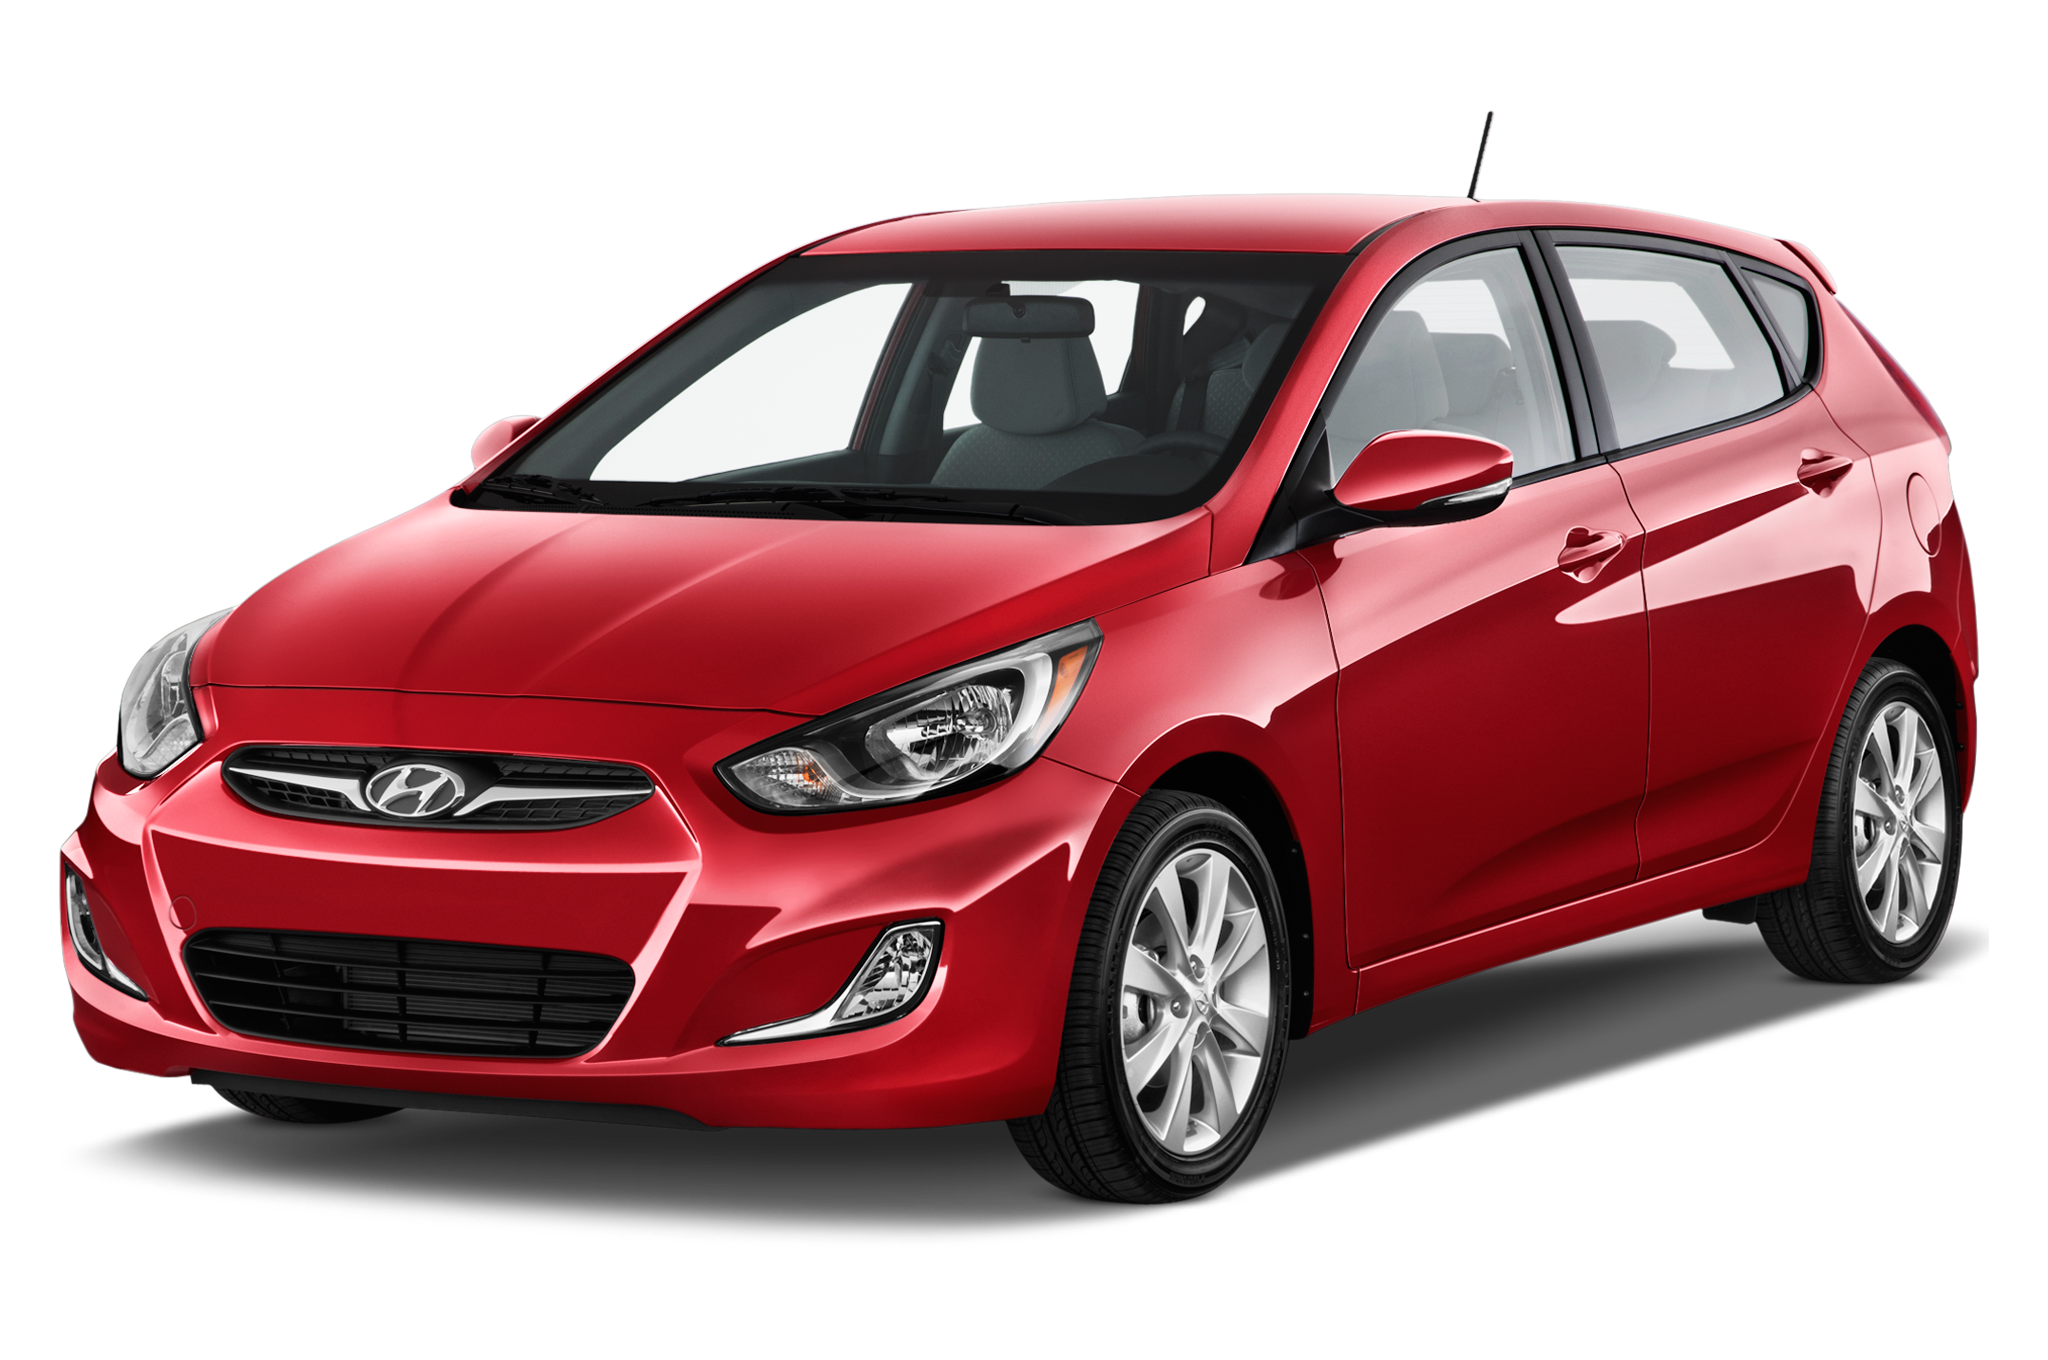 Hyundai ACCENT GS 5-Door 6-Sd Automatic 2014 - International ...